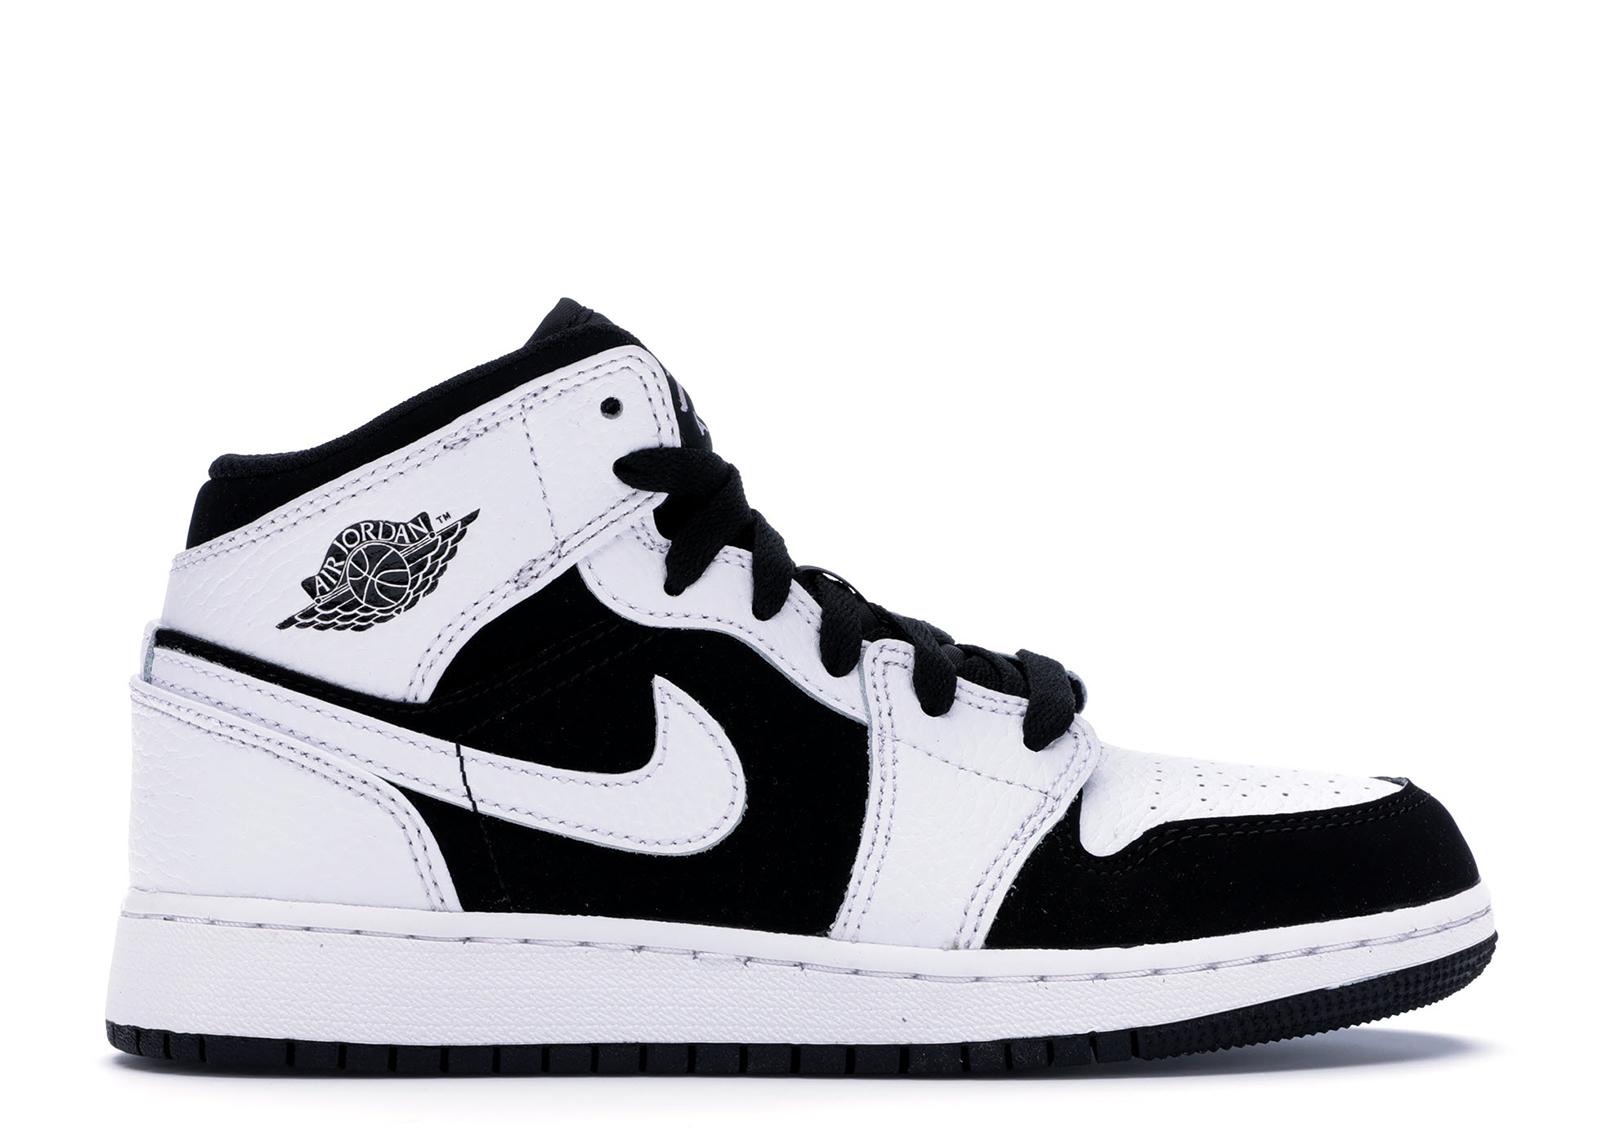 Jordan 1 Mid White Black (GS) - 554725-113